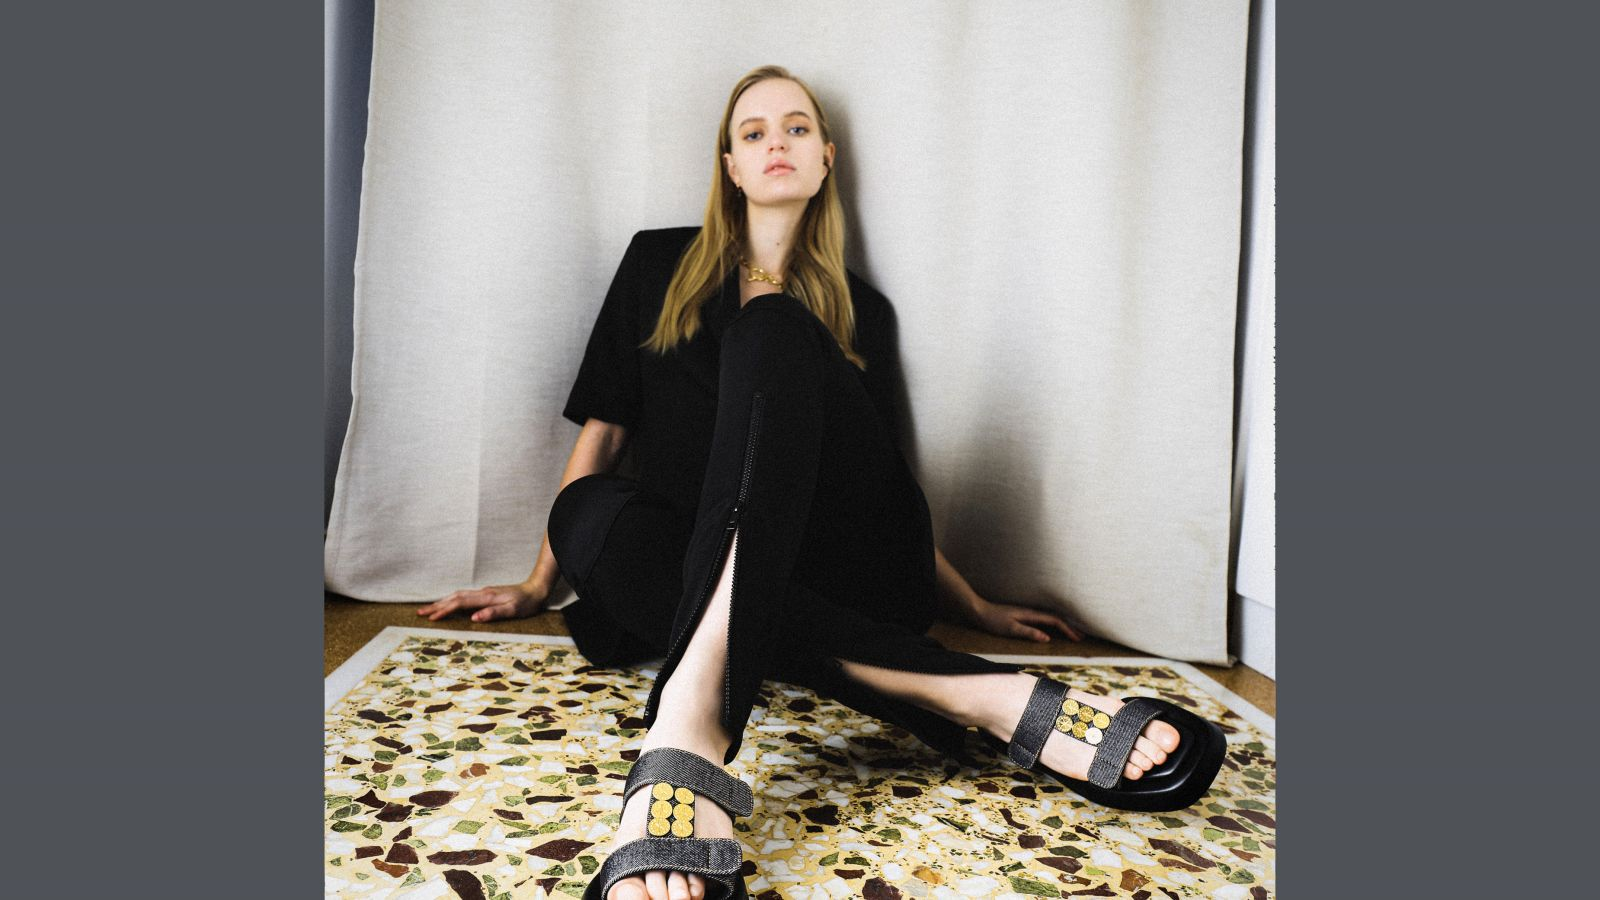 Kooreloo: Το διάσημο ελληνικό brand λανσάρει την πρώτη του συλλογή παπουτσιών